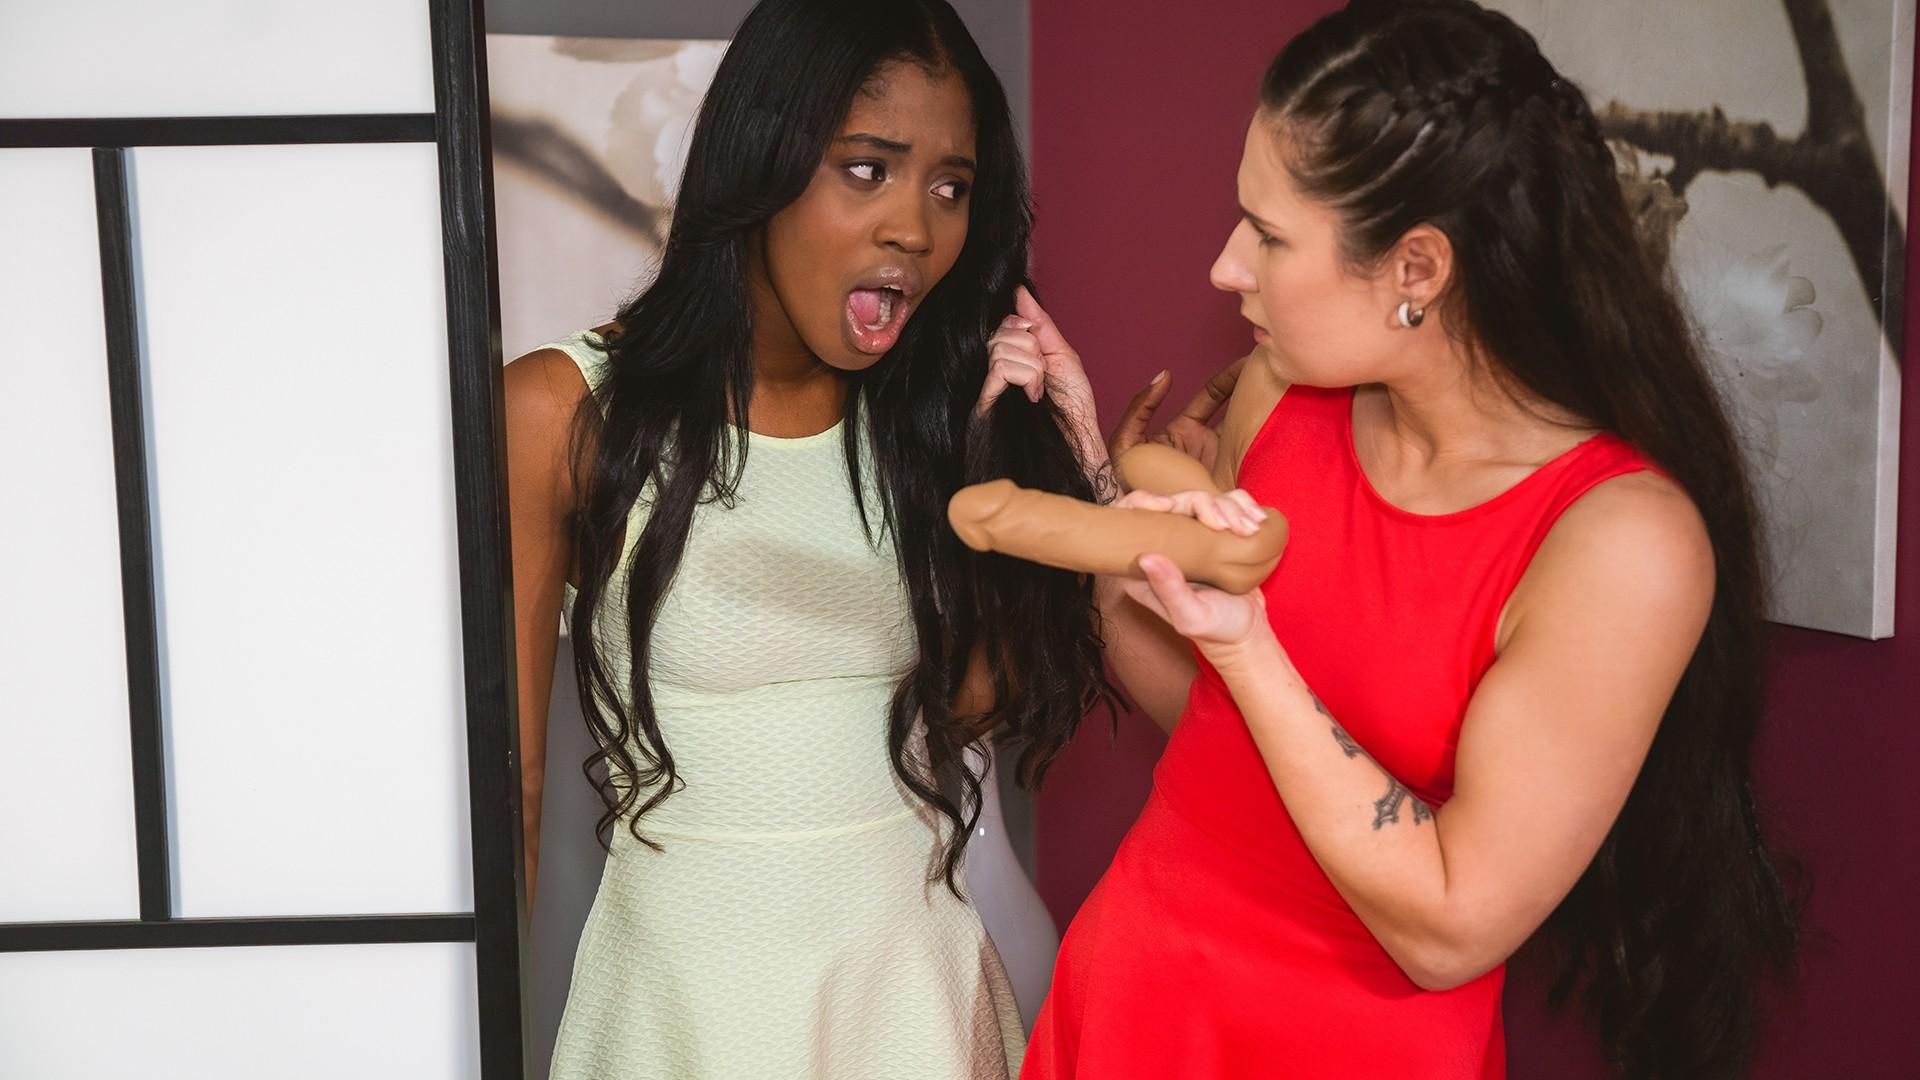 Ebony teen shares dildo pleasure - Lesbea